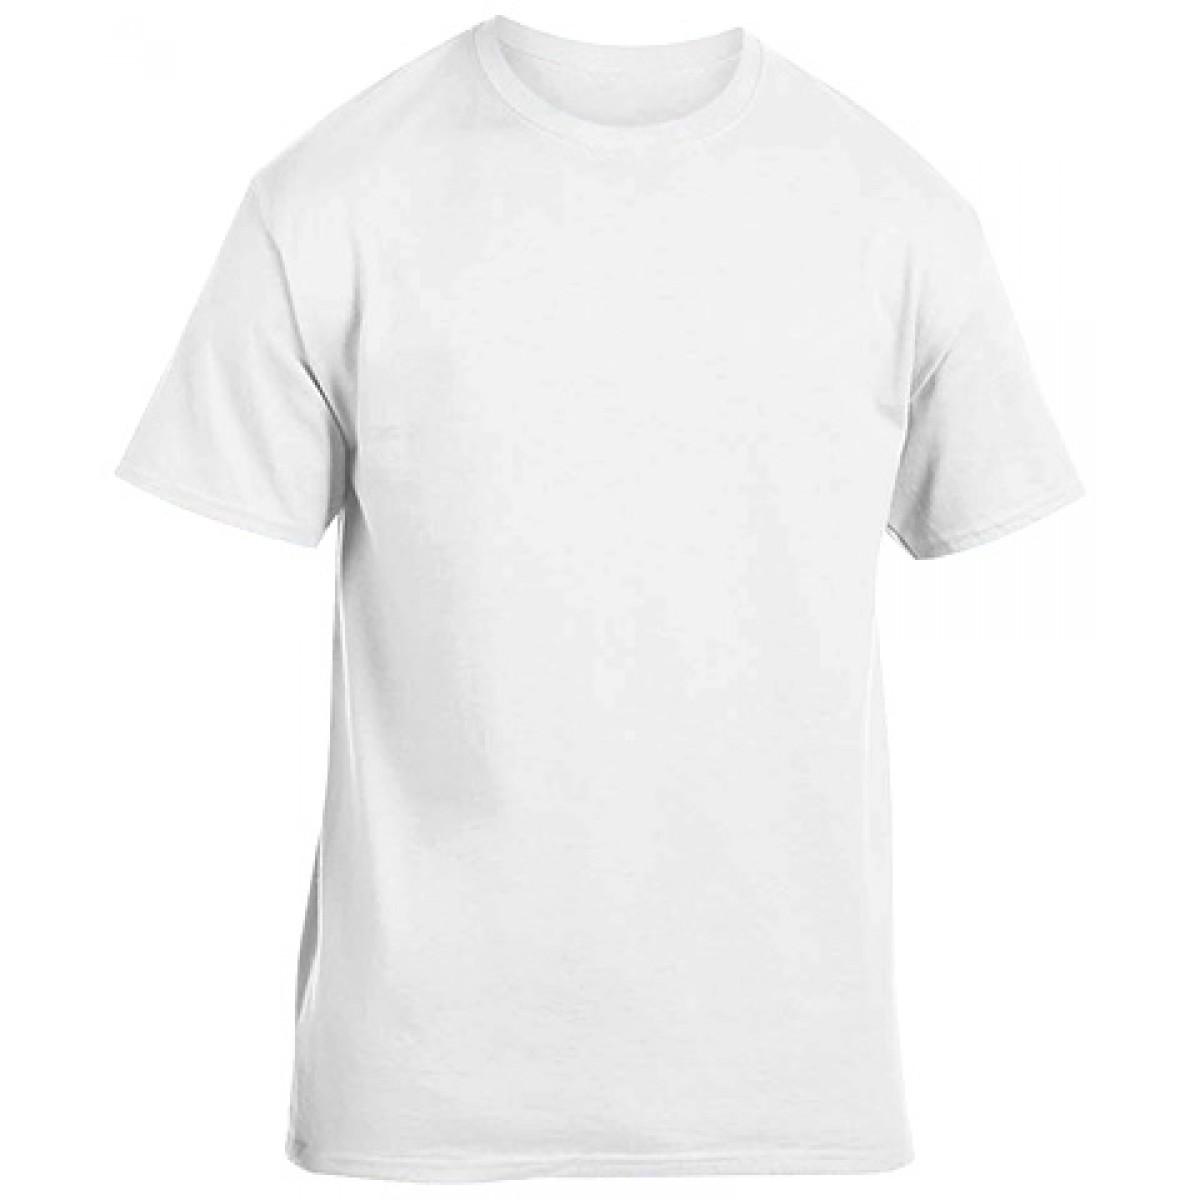 Soft 100% Cotton T-Shirt-White-YL